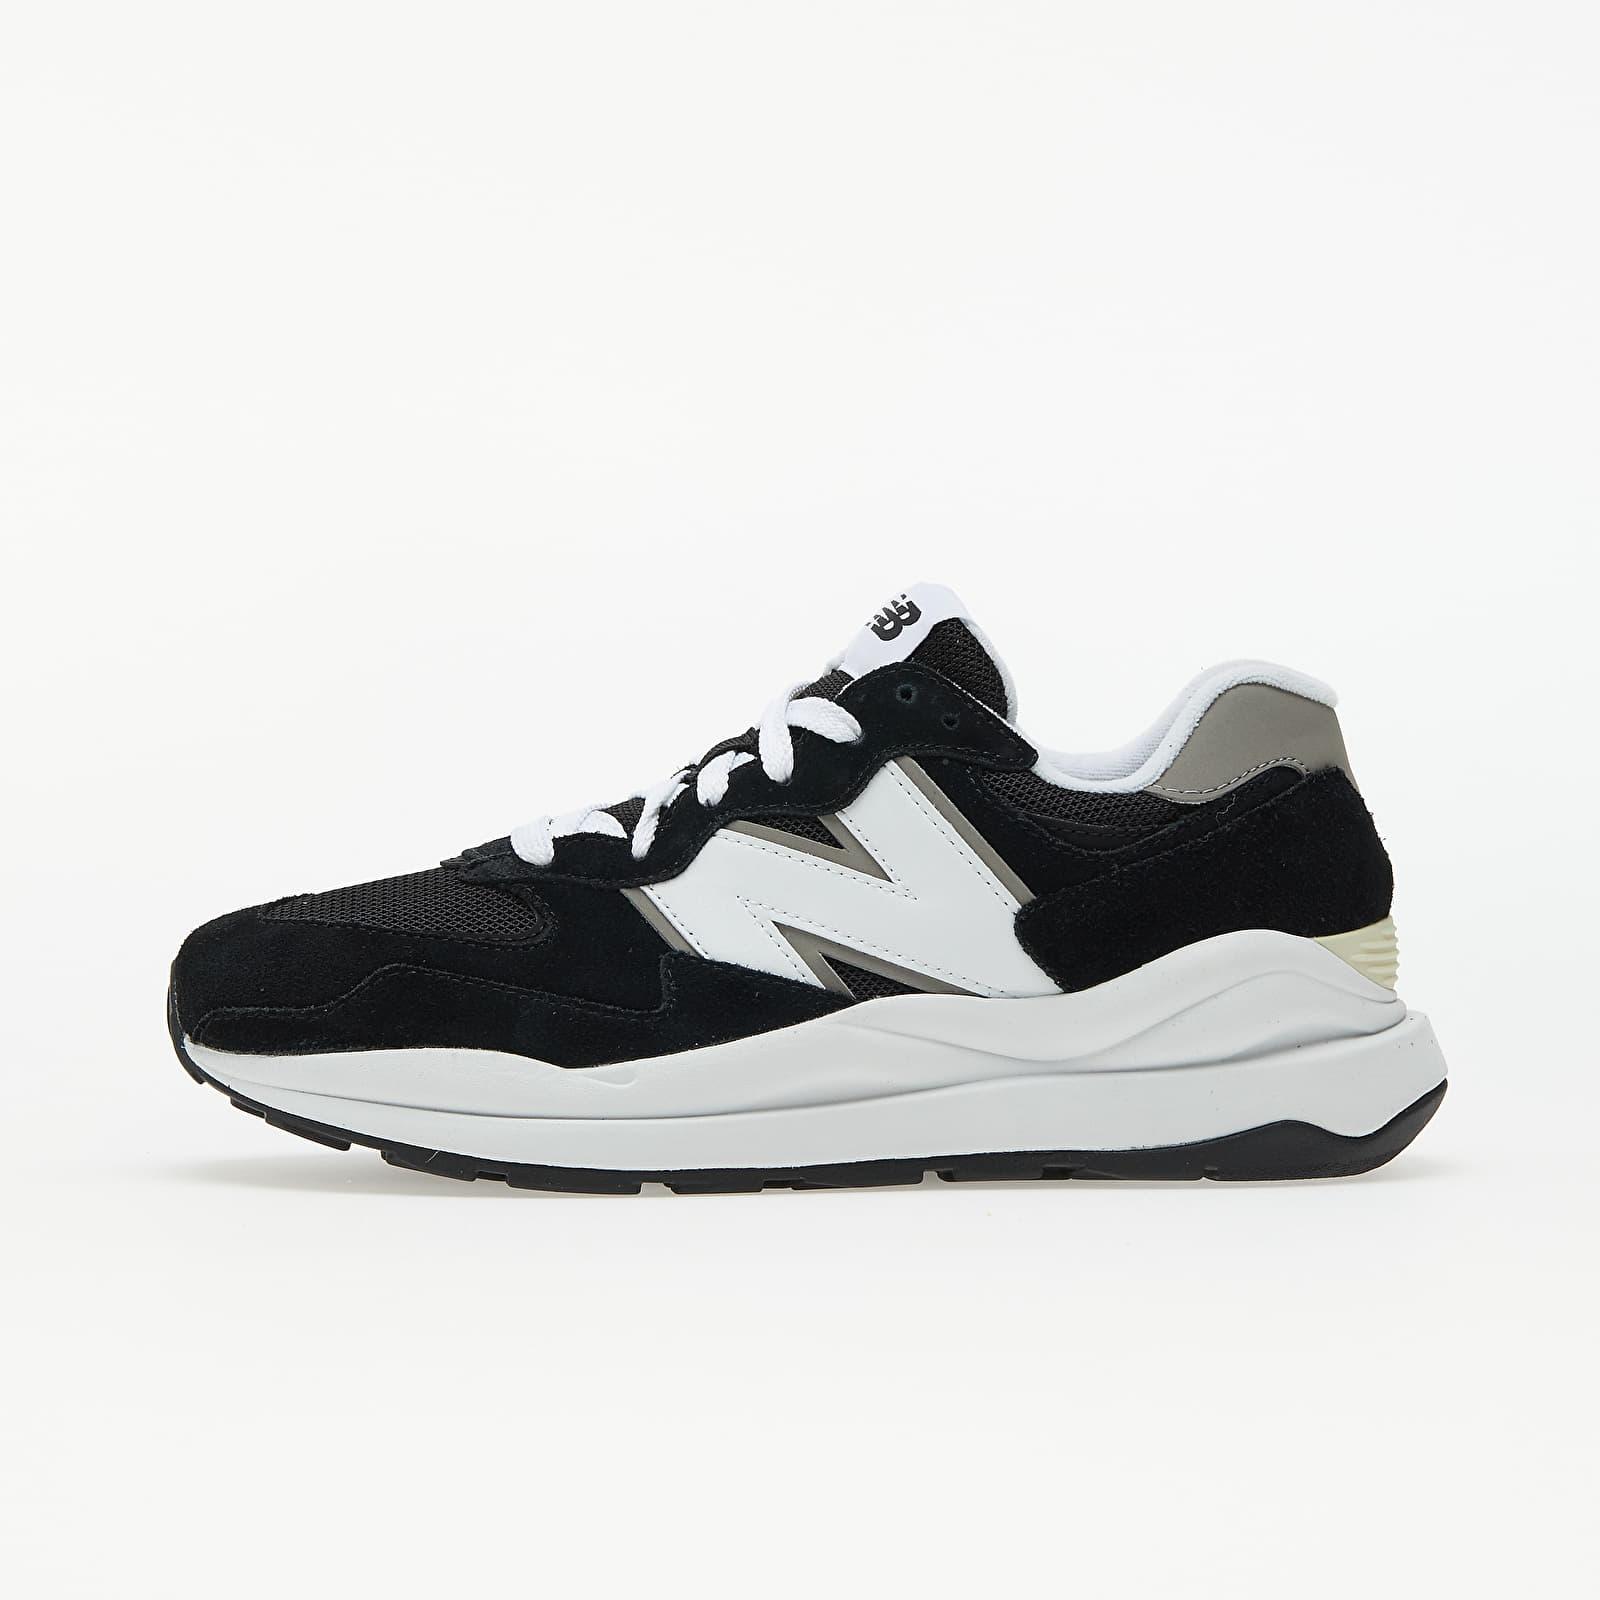 New Balance 574 Black/ White EUR 42.5